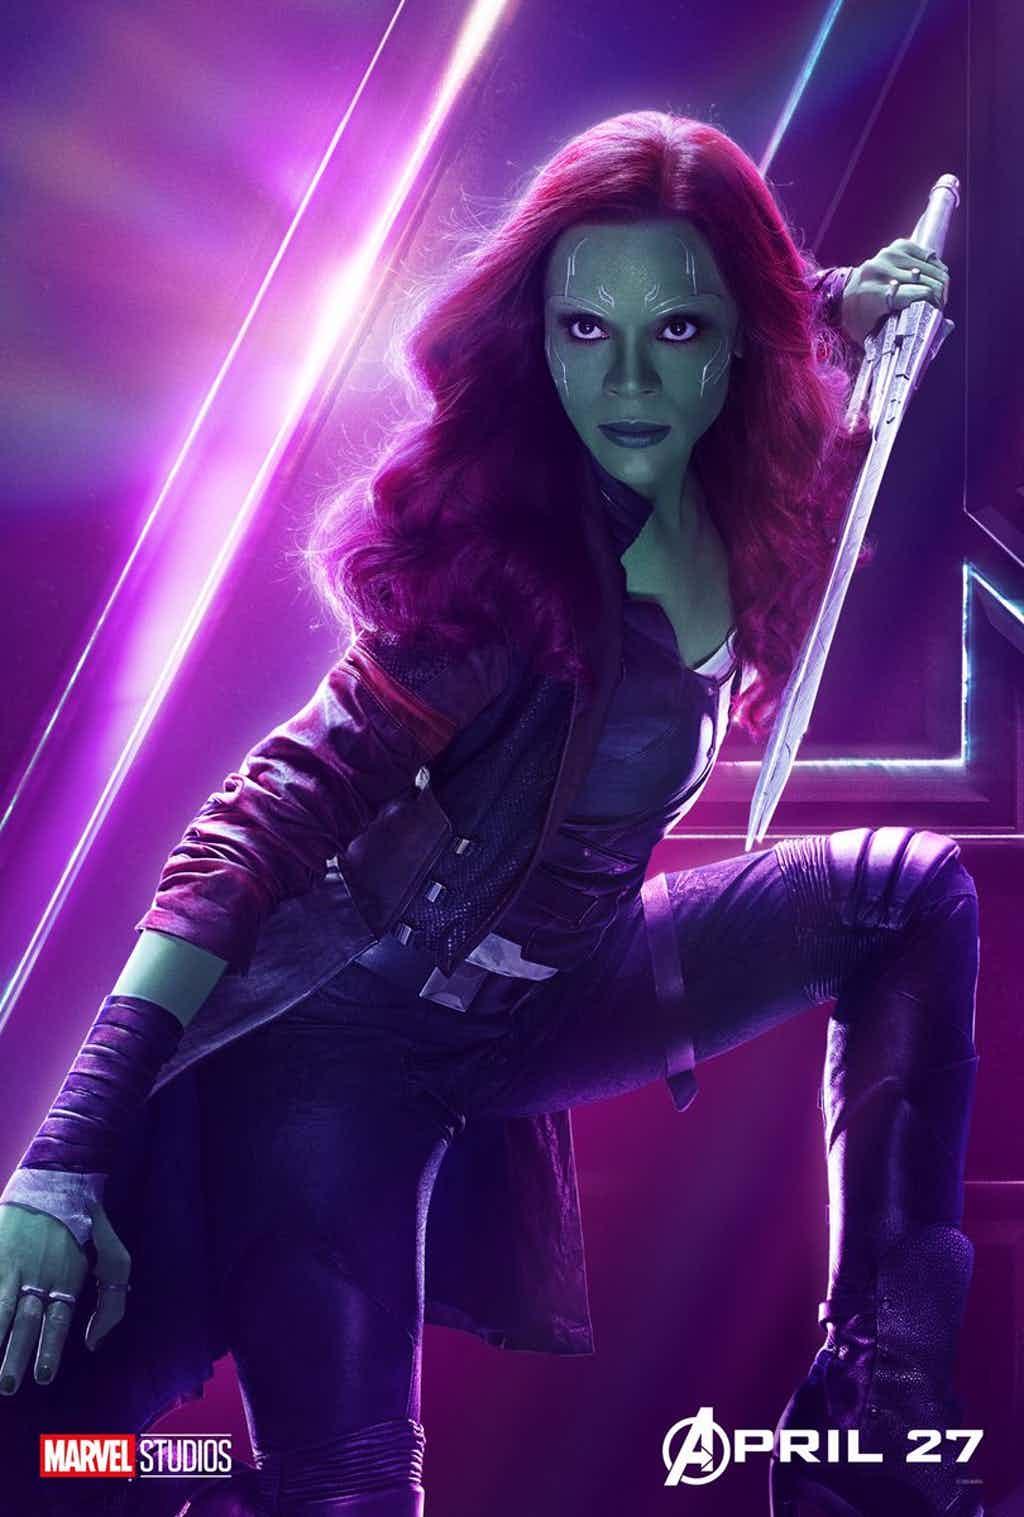 szmk_marvel_infinity_war_vegtelen_haboru_bosszuallok_avengers_ironman_hulk_thor_captainamaerica_guardians_galaxy_6.jpg